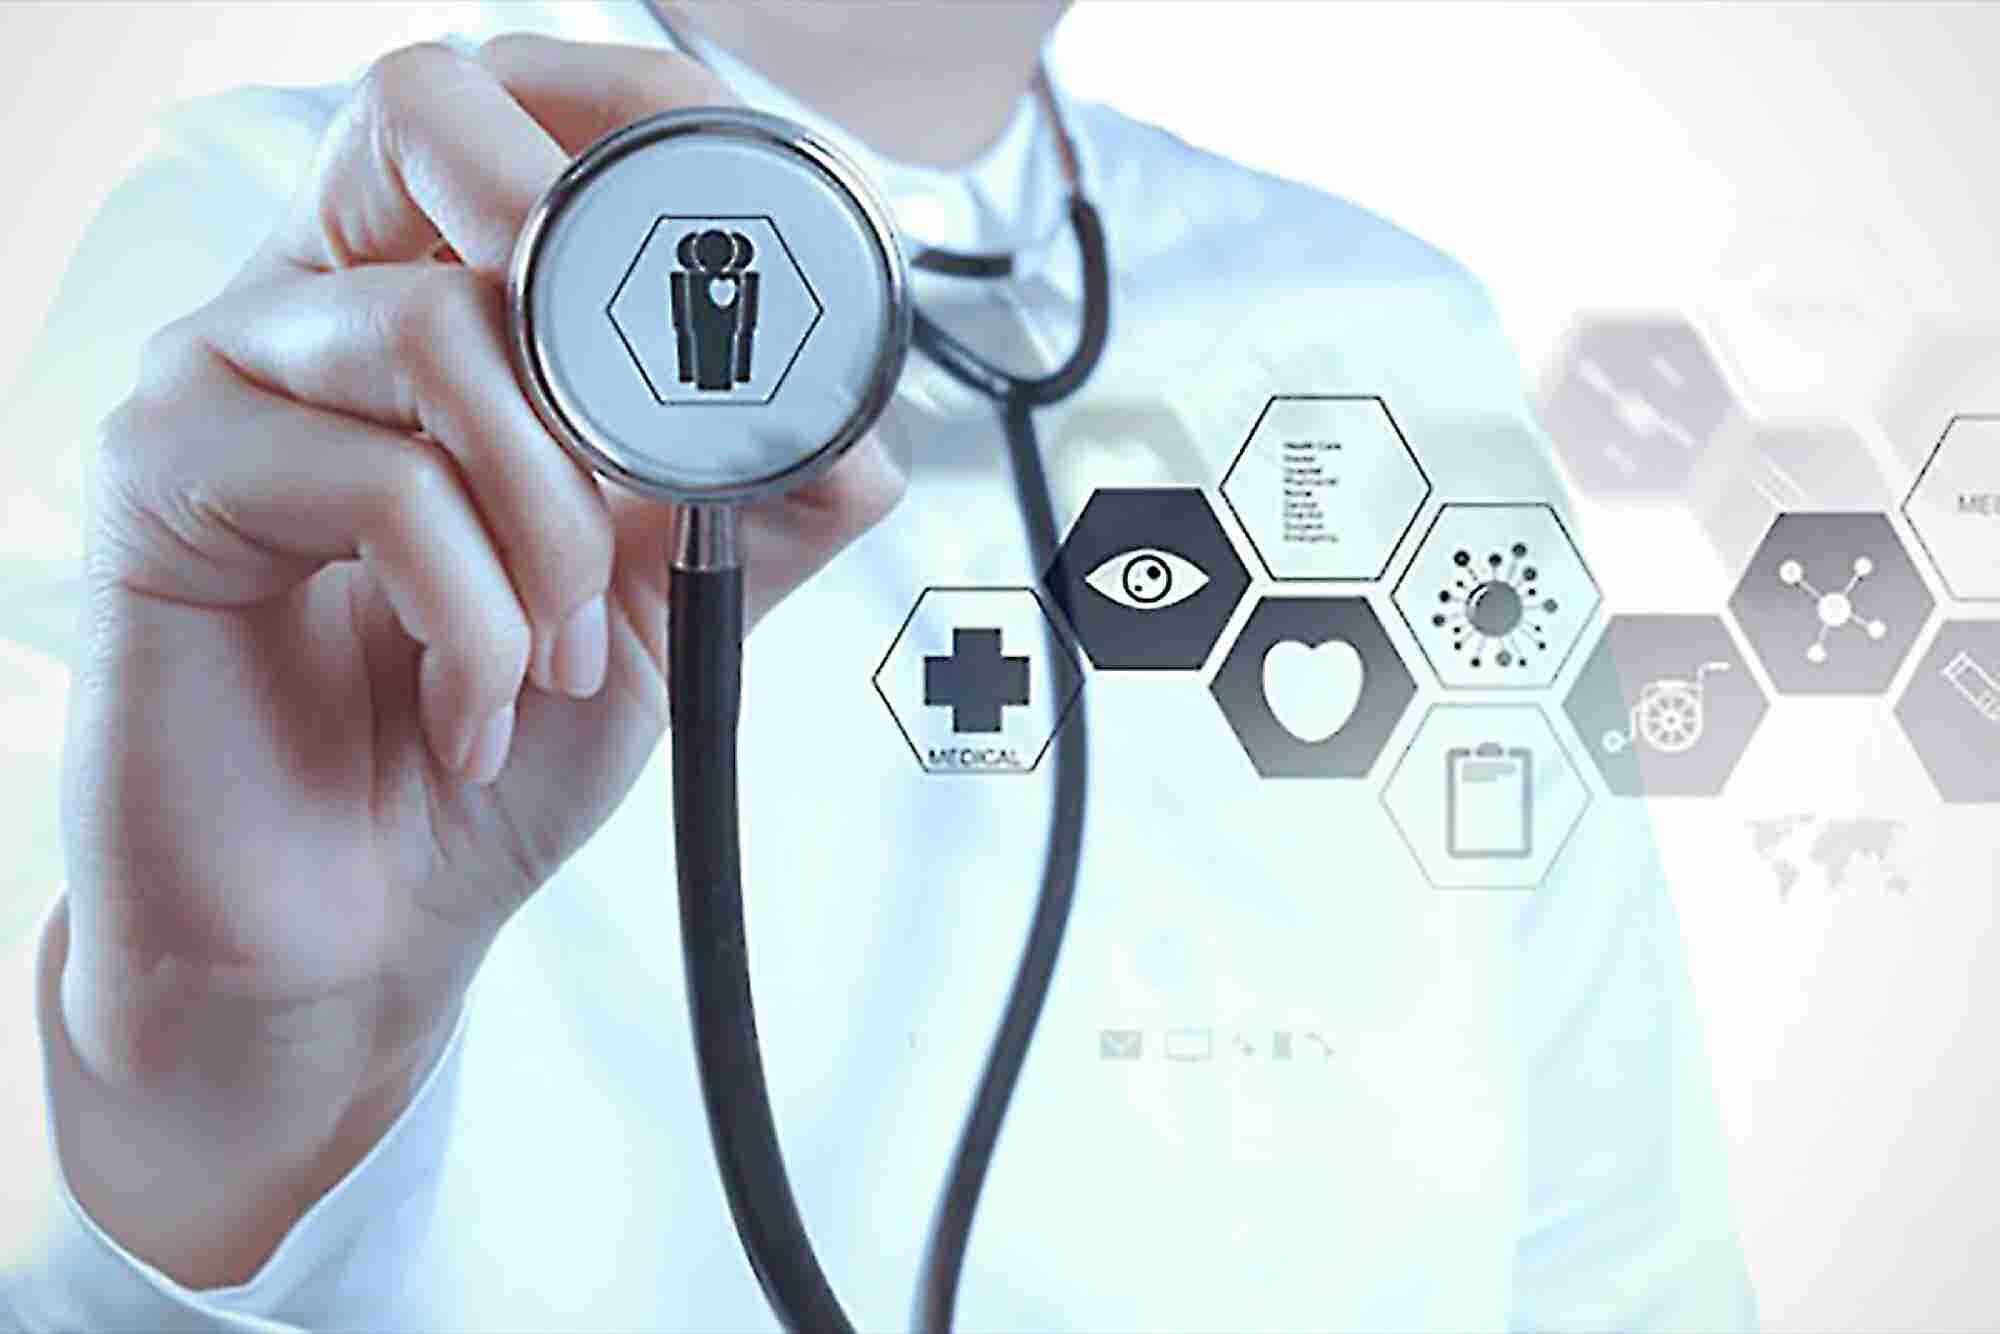 Championing Patient-Centered Innovation